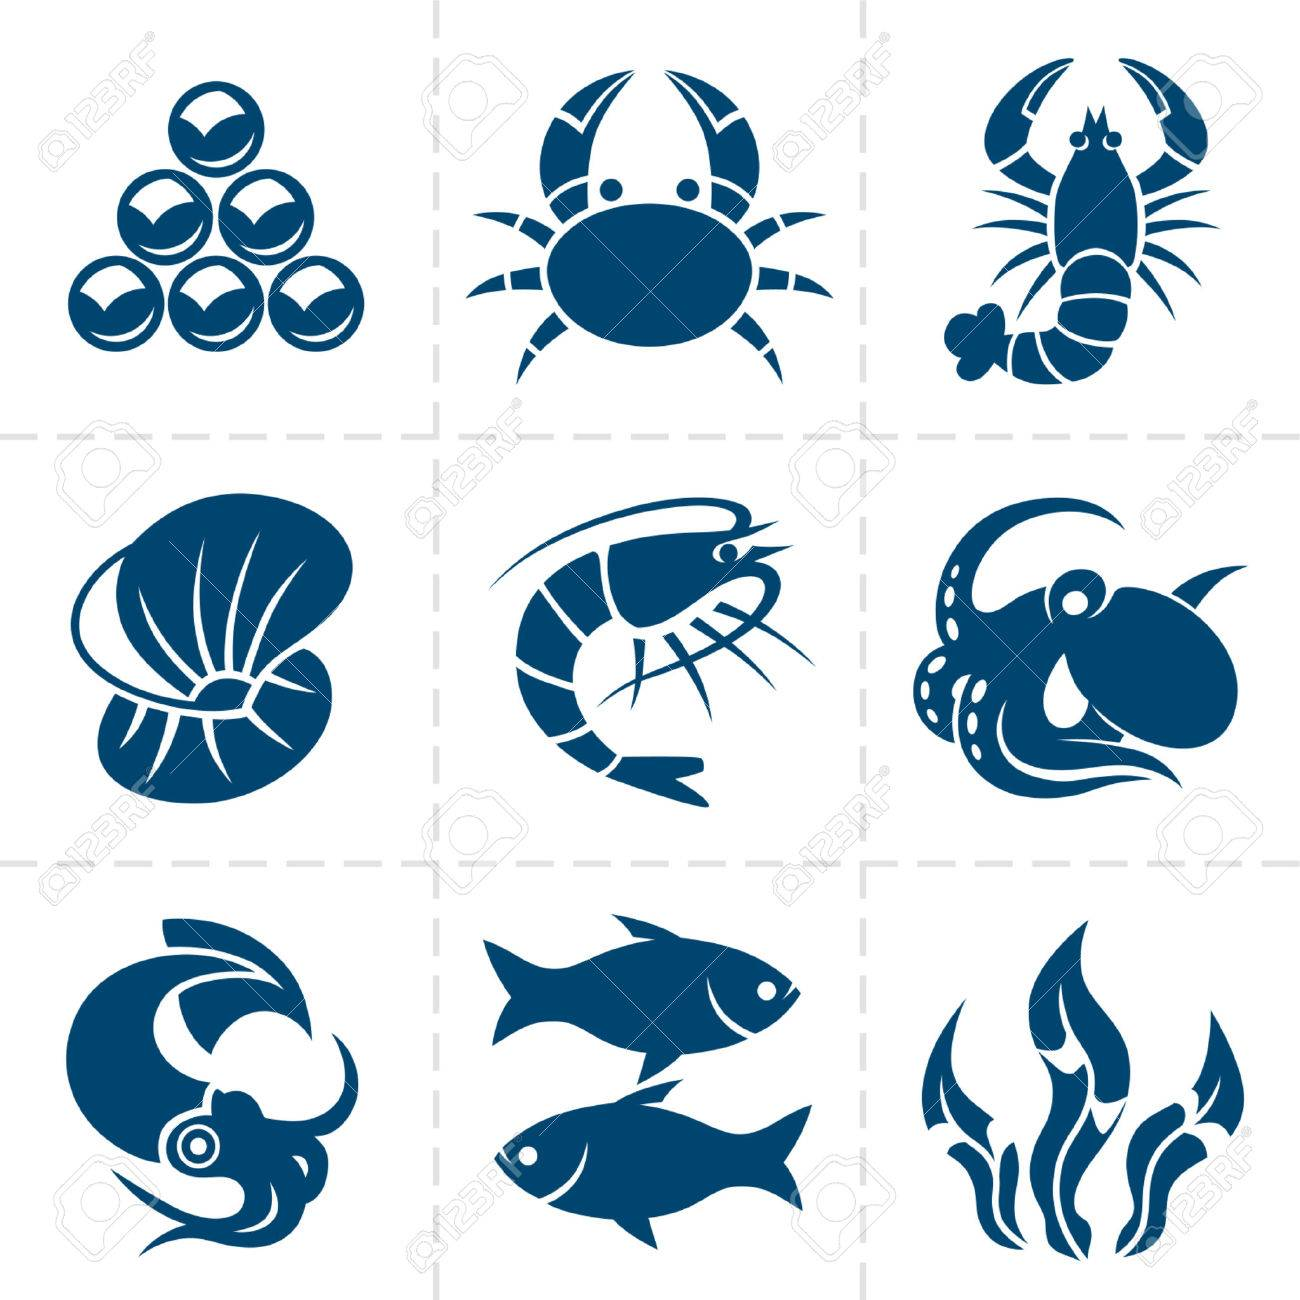 Seafood icon set - 35147007